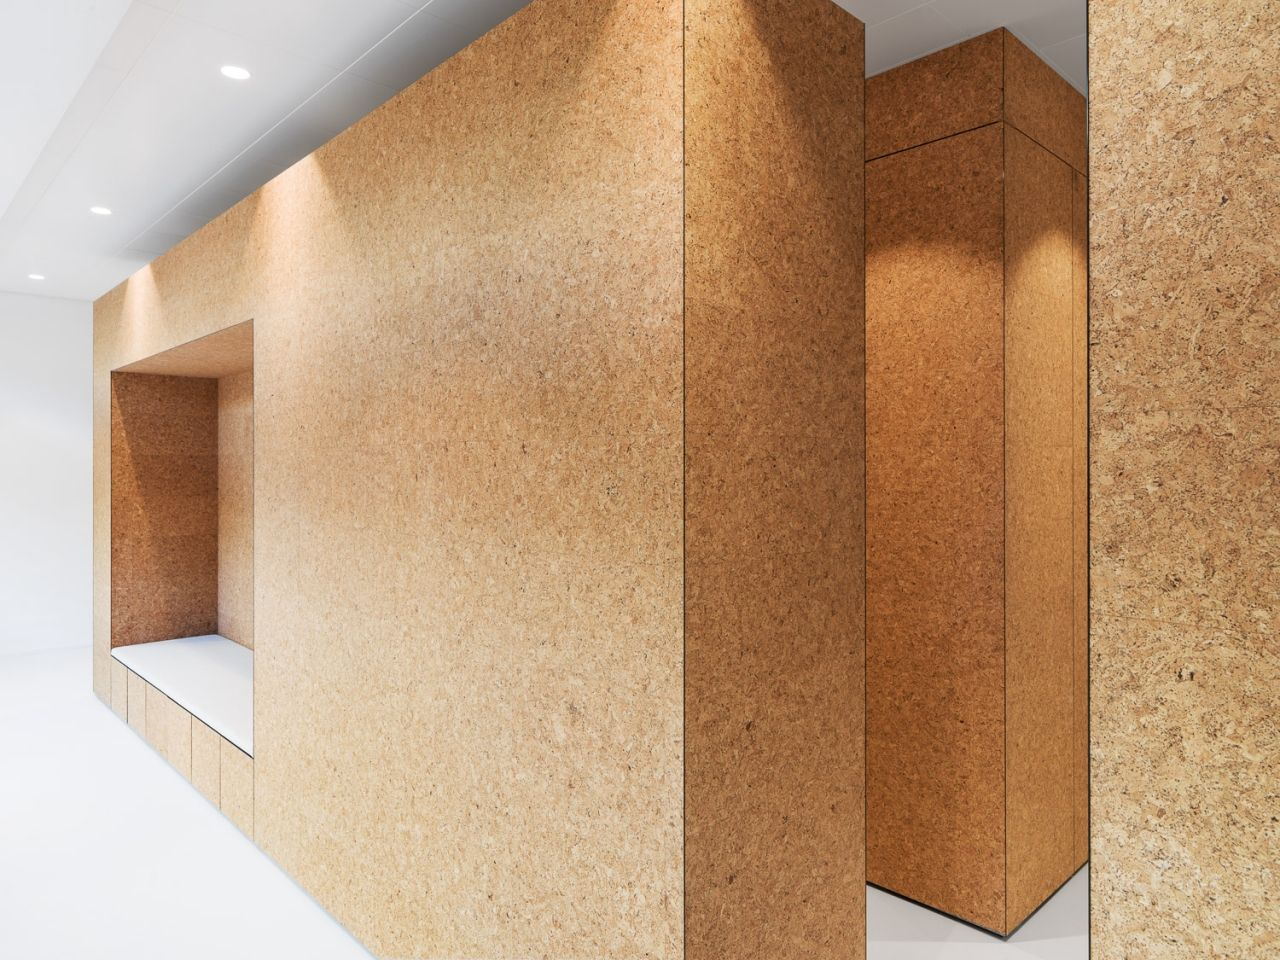 Home-office-innenarchitektur inspiration dost  architektur  innenarchitektur  stadtentwicklung